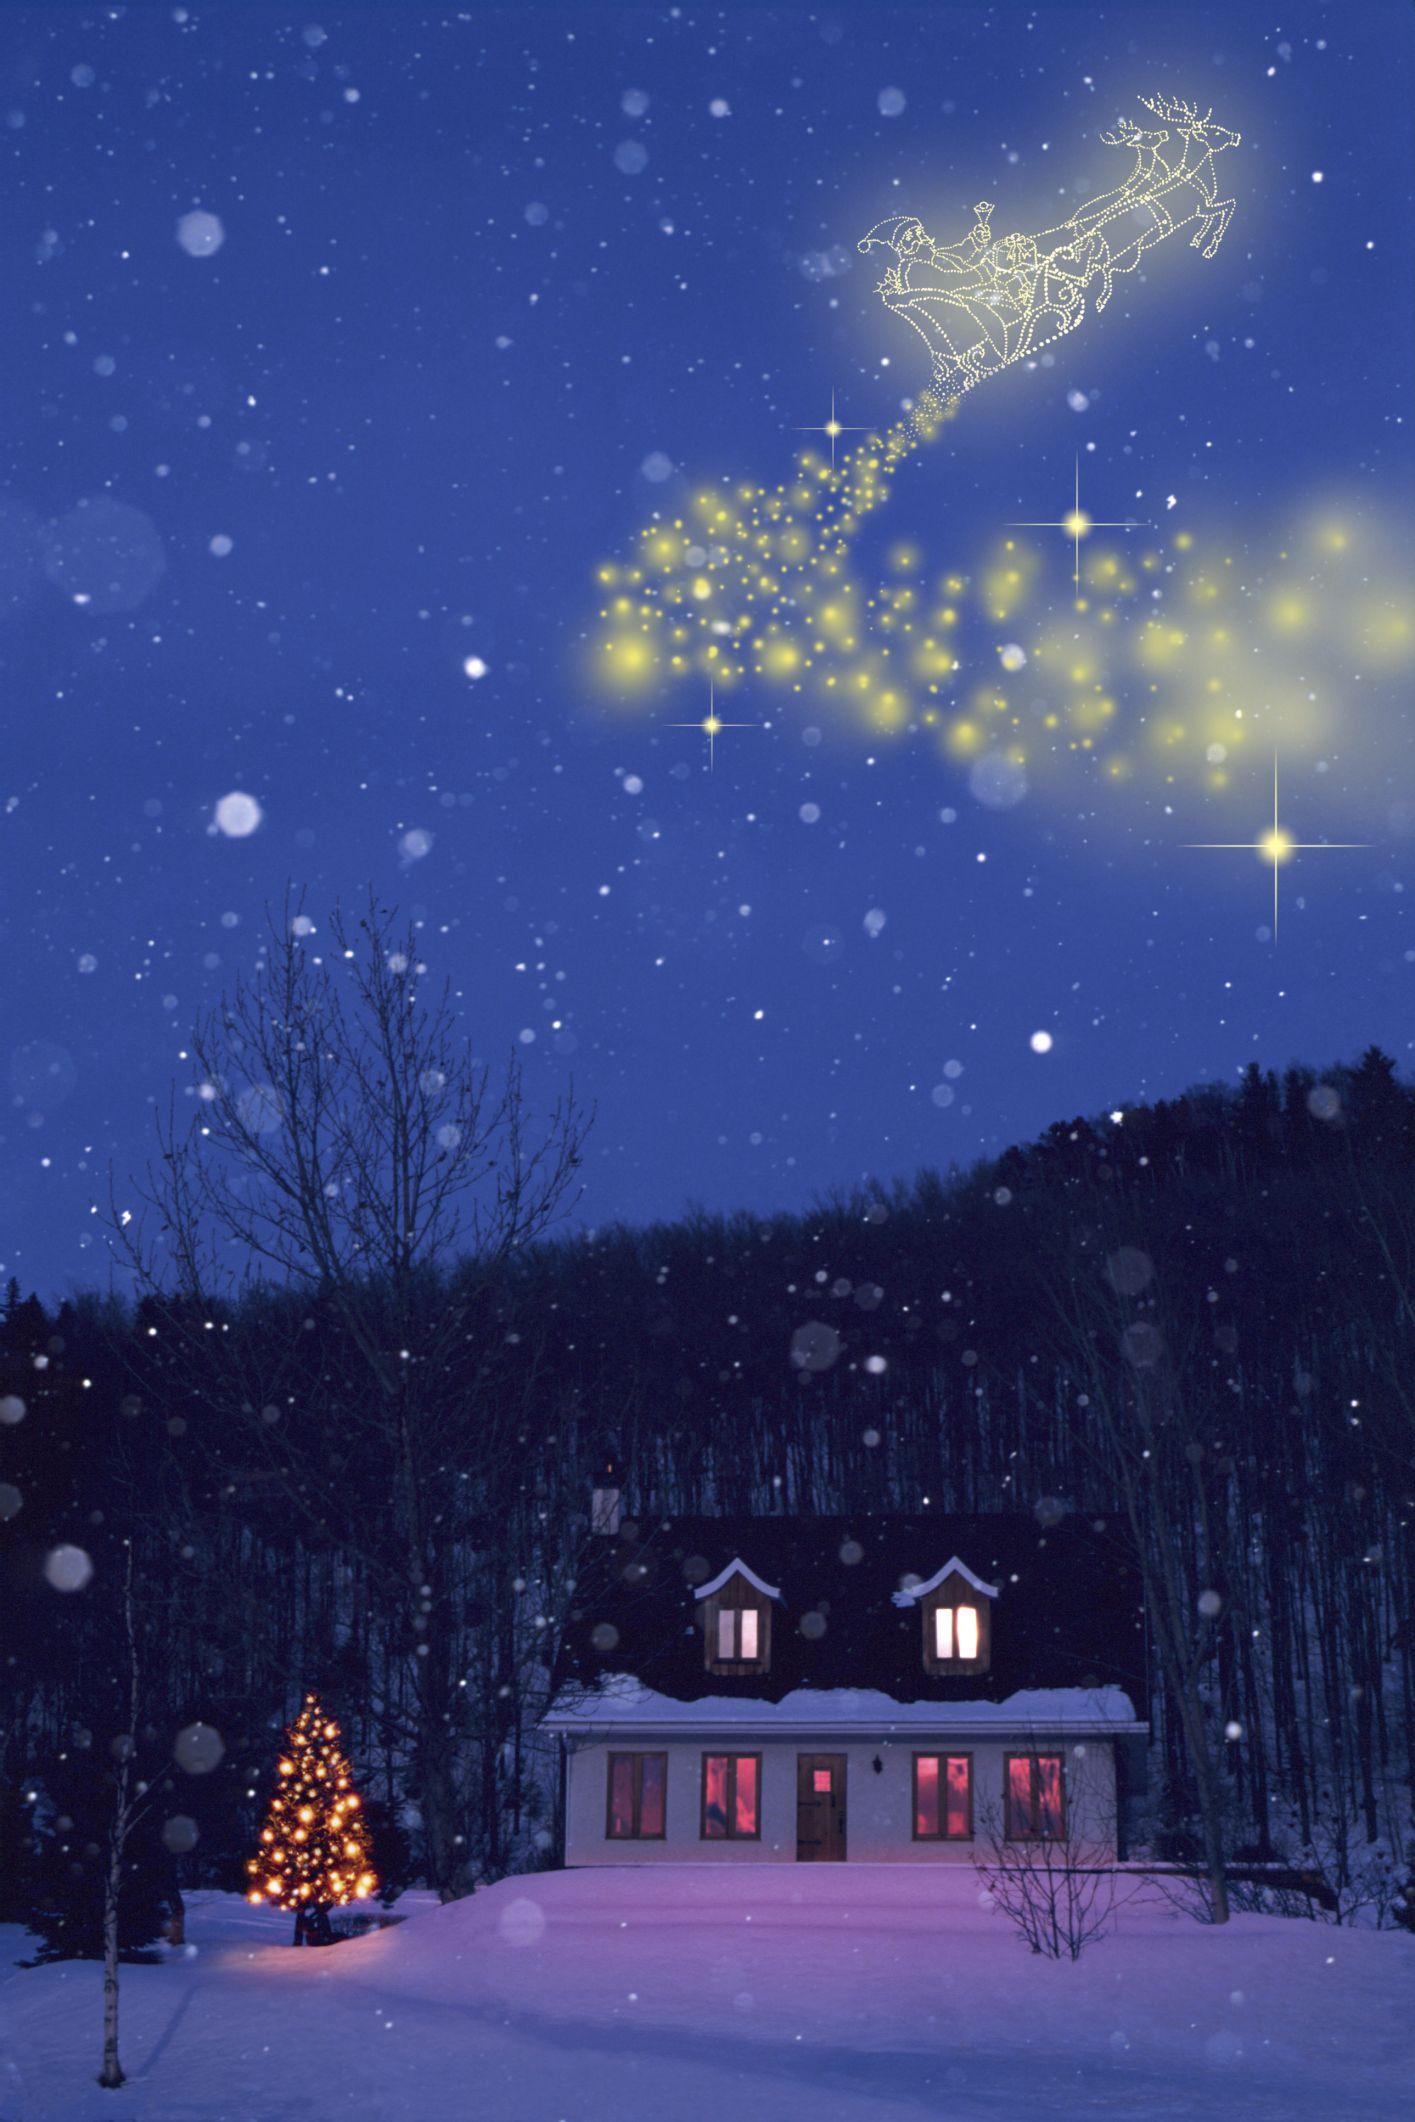 25 Ways to Make Christmas More Magical Than Ever